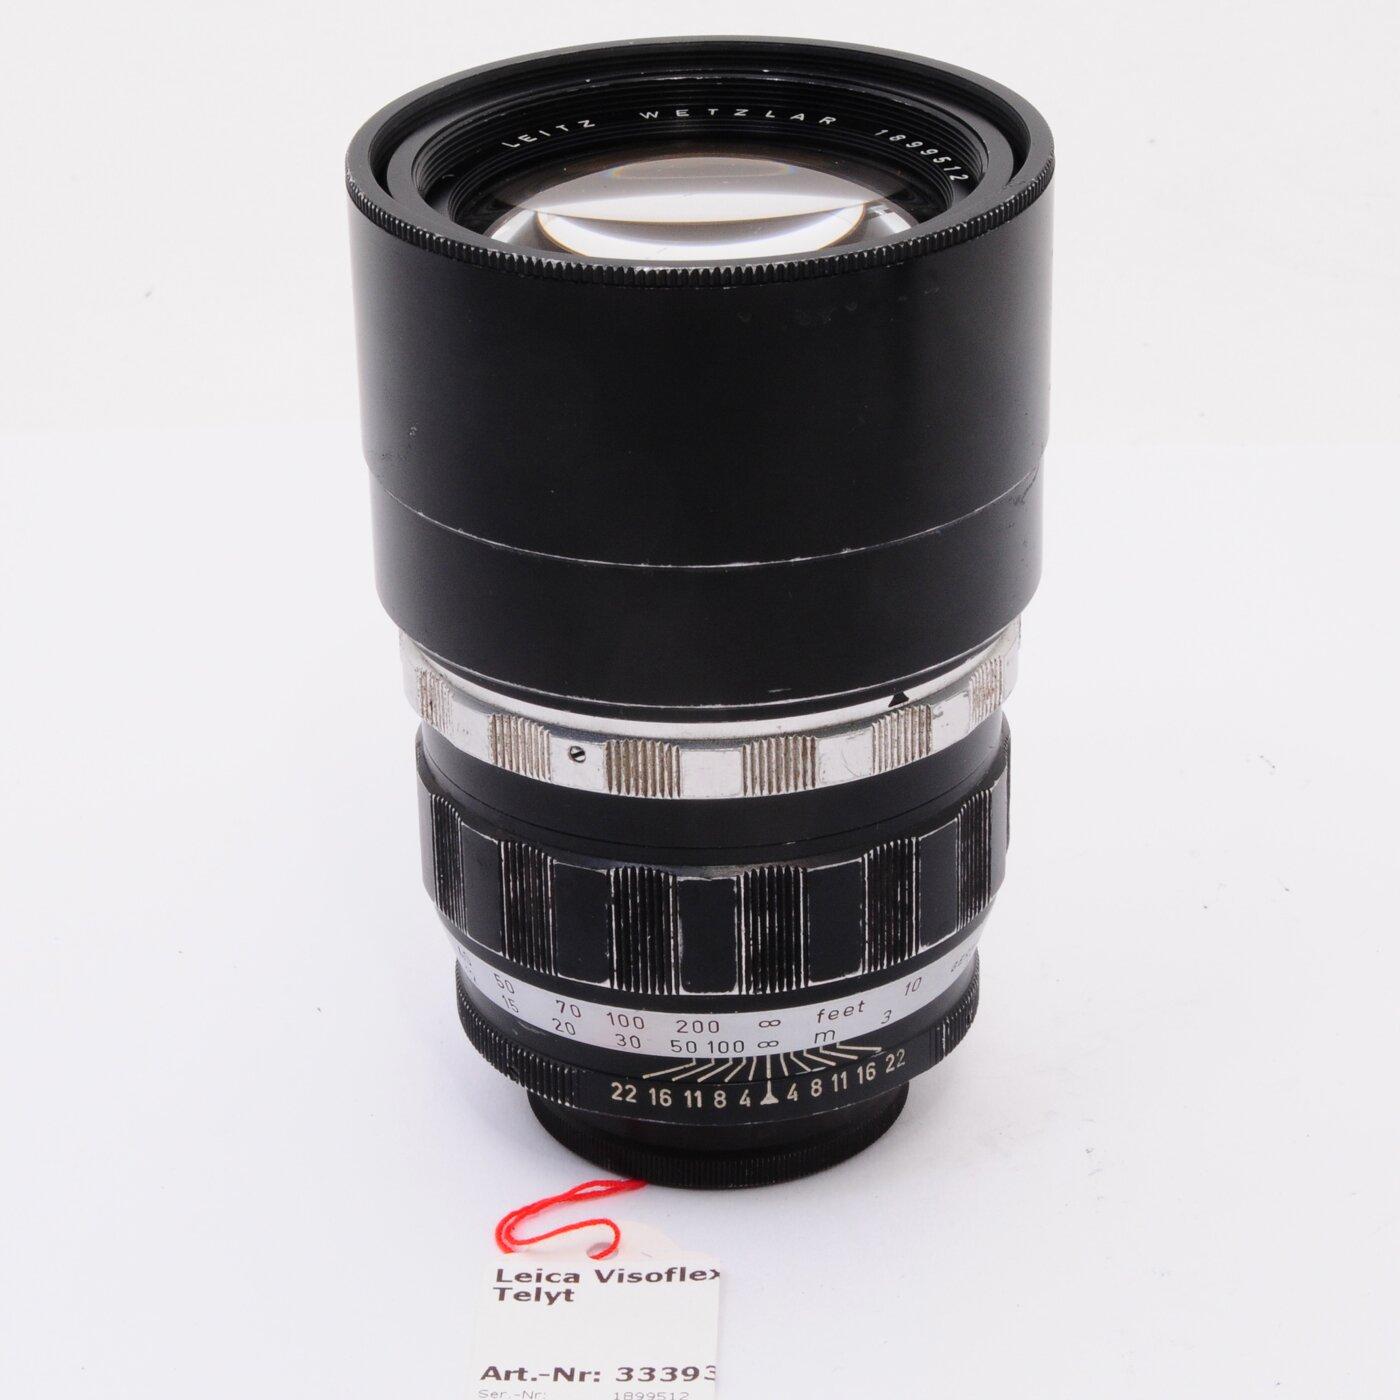 Leica Visoflex 200mm 1:4 Telyt